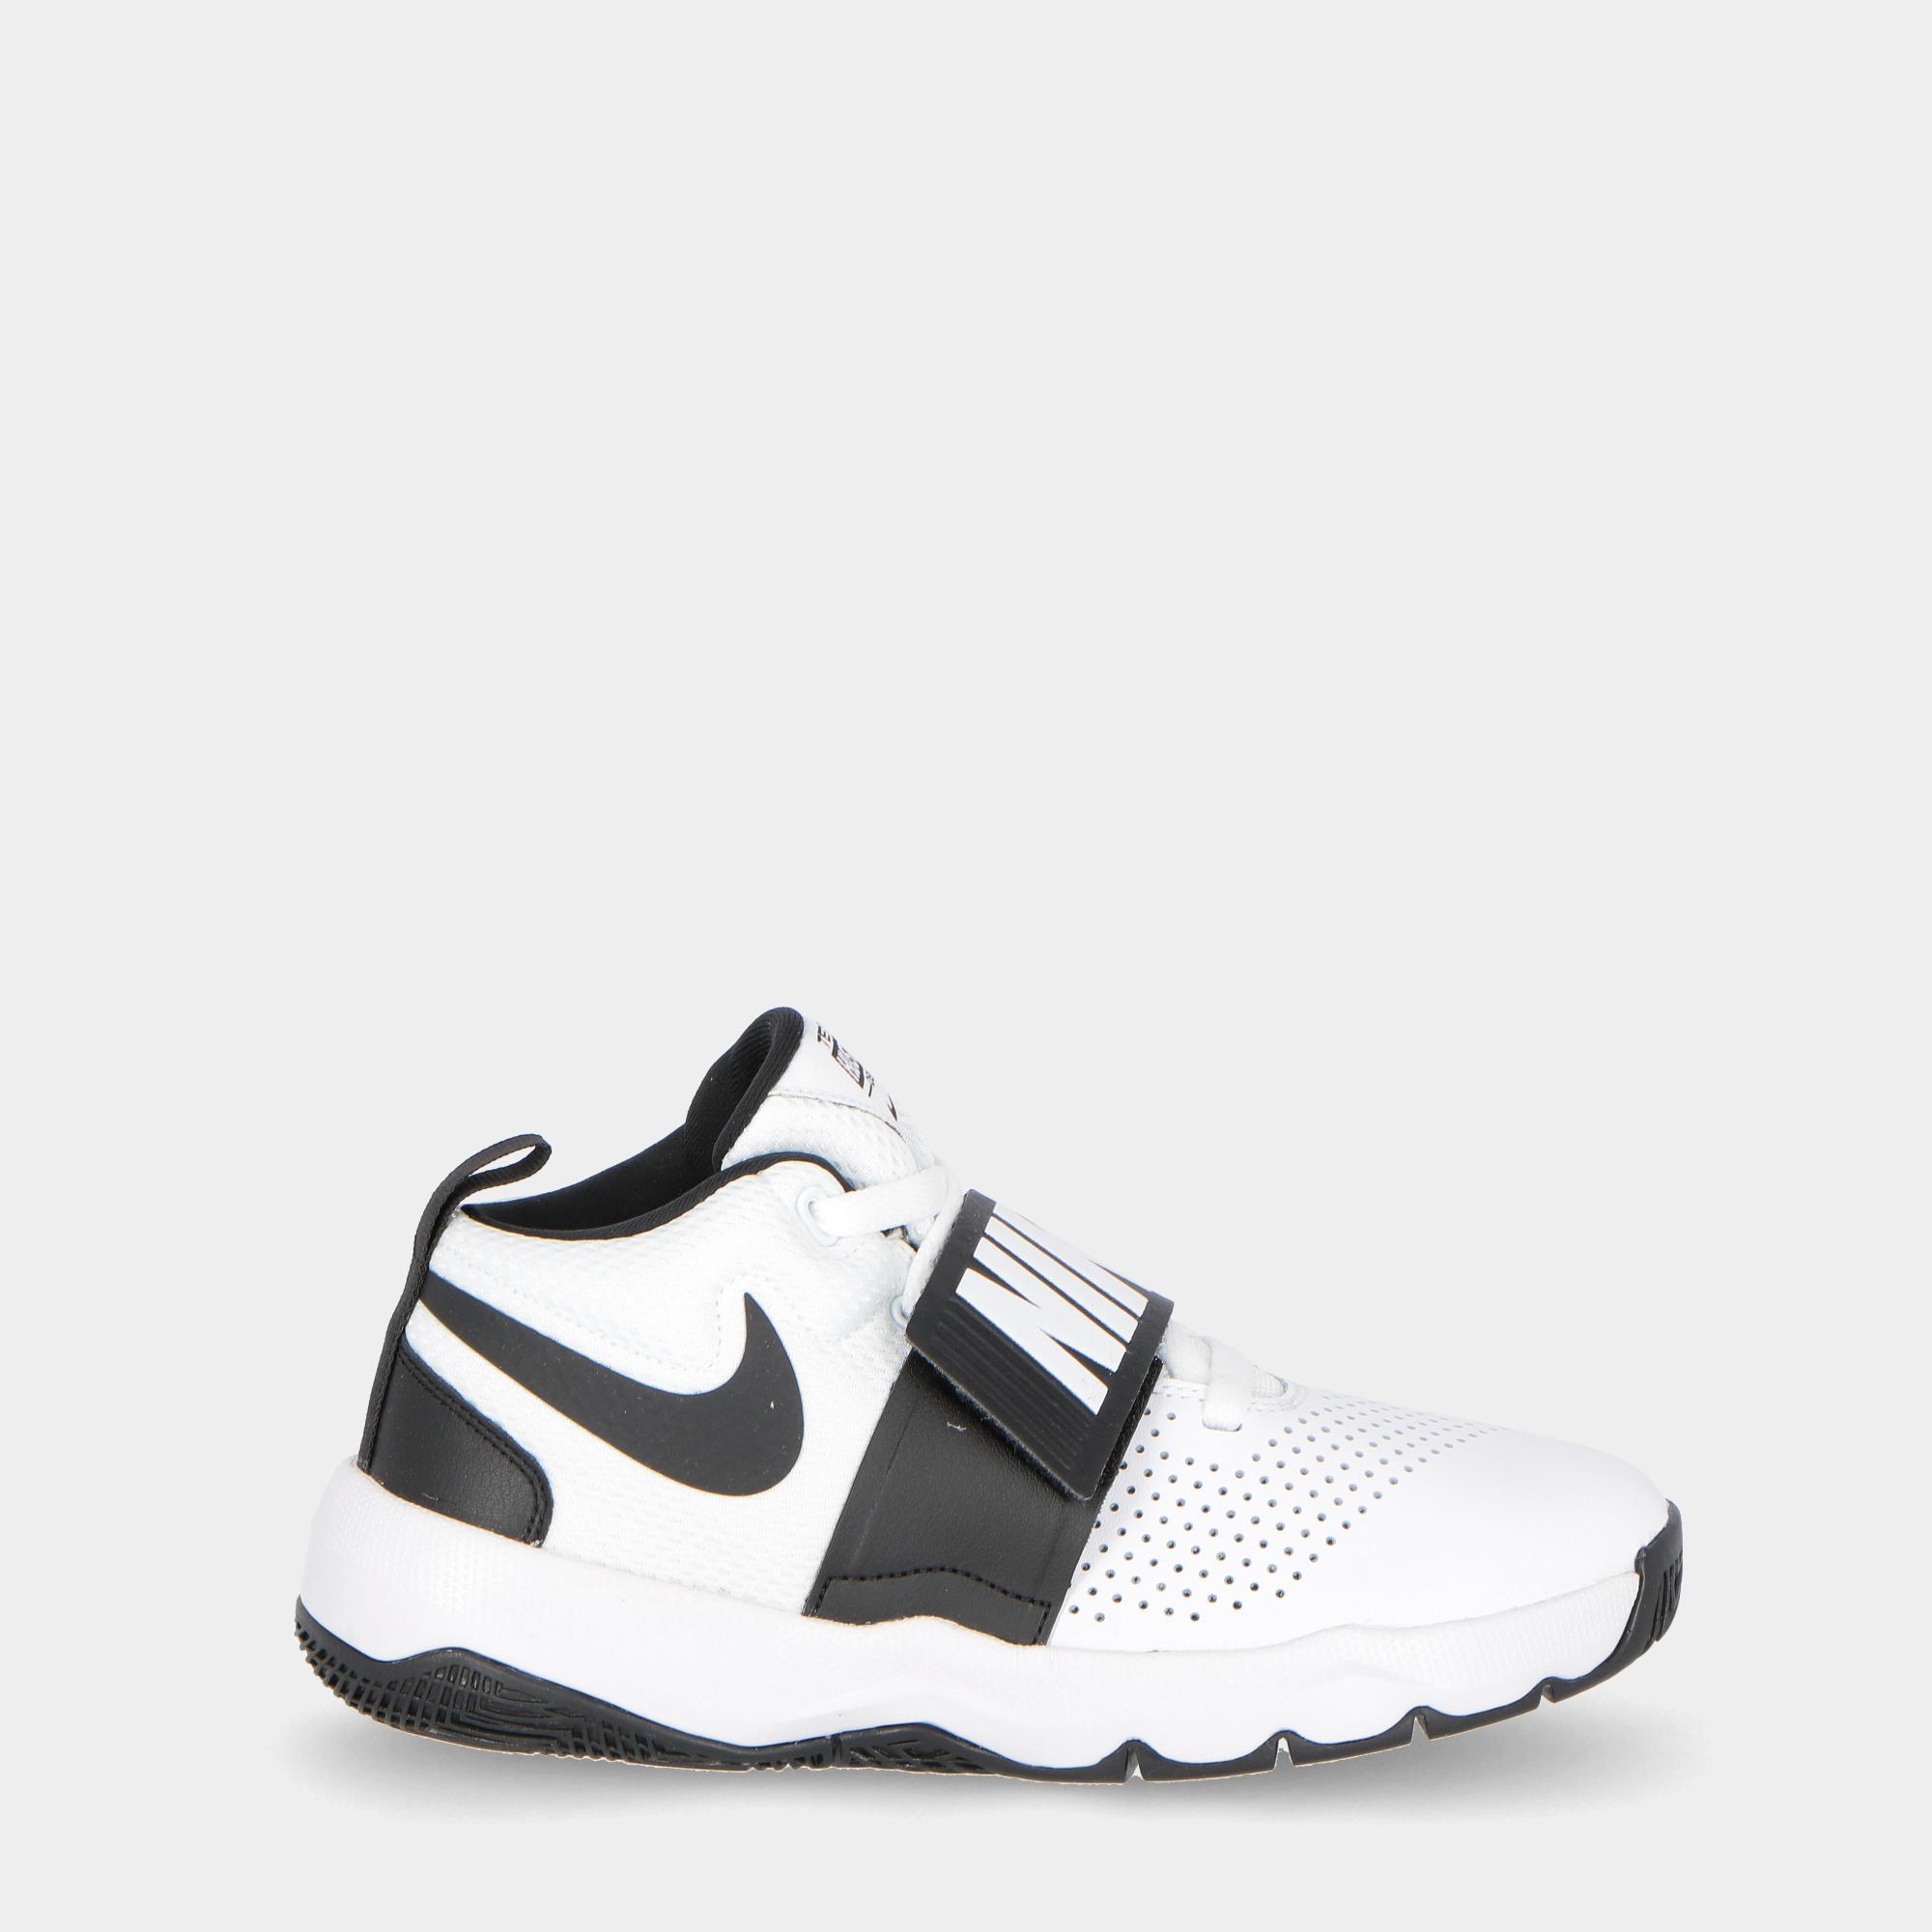 5dee28022e0 Nike Team Hustle D8 (gs) - Kids White Black